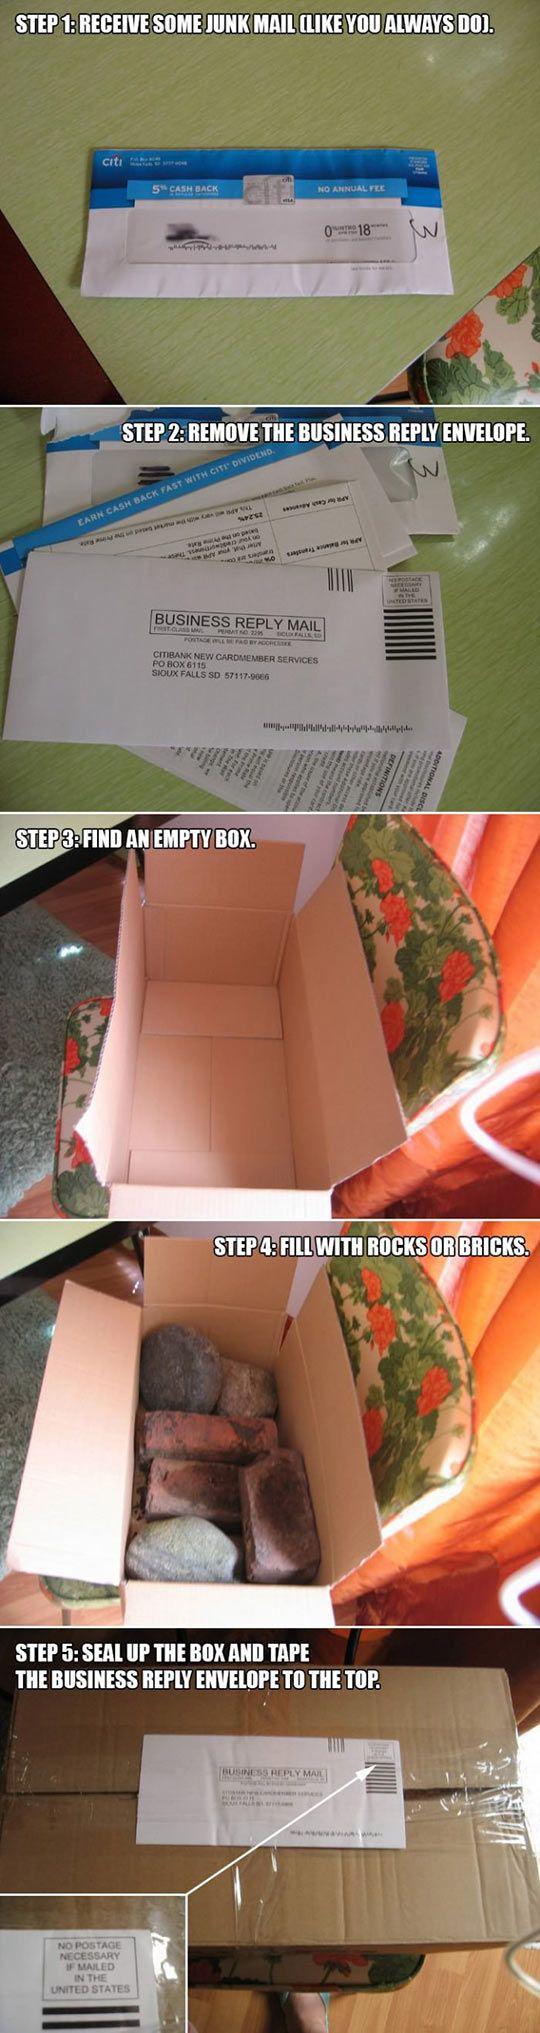 Tired of getting junk mail? - Genius...SO genius!